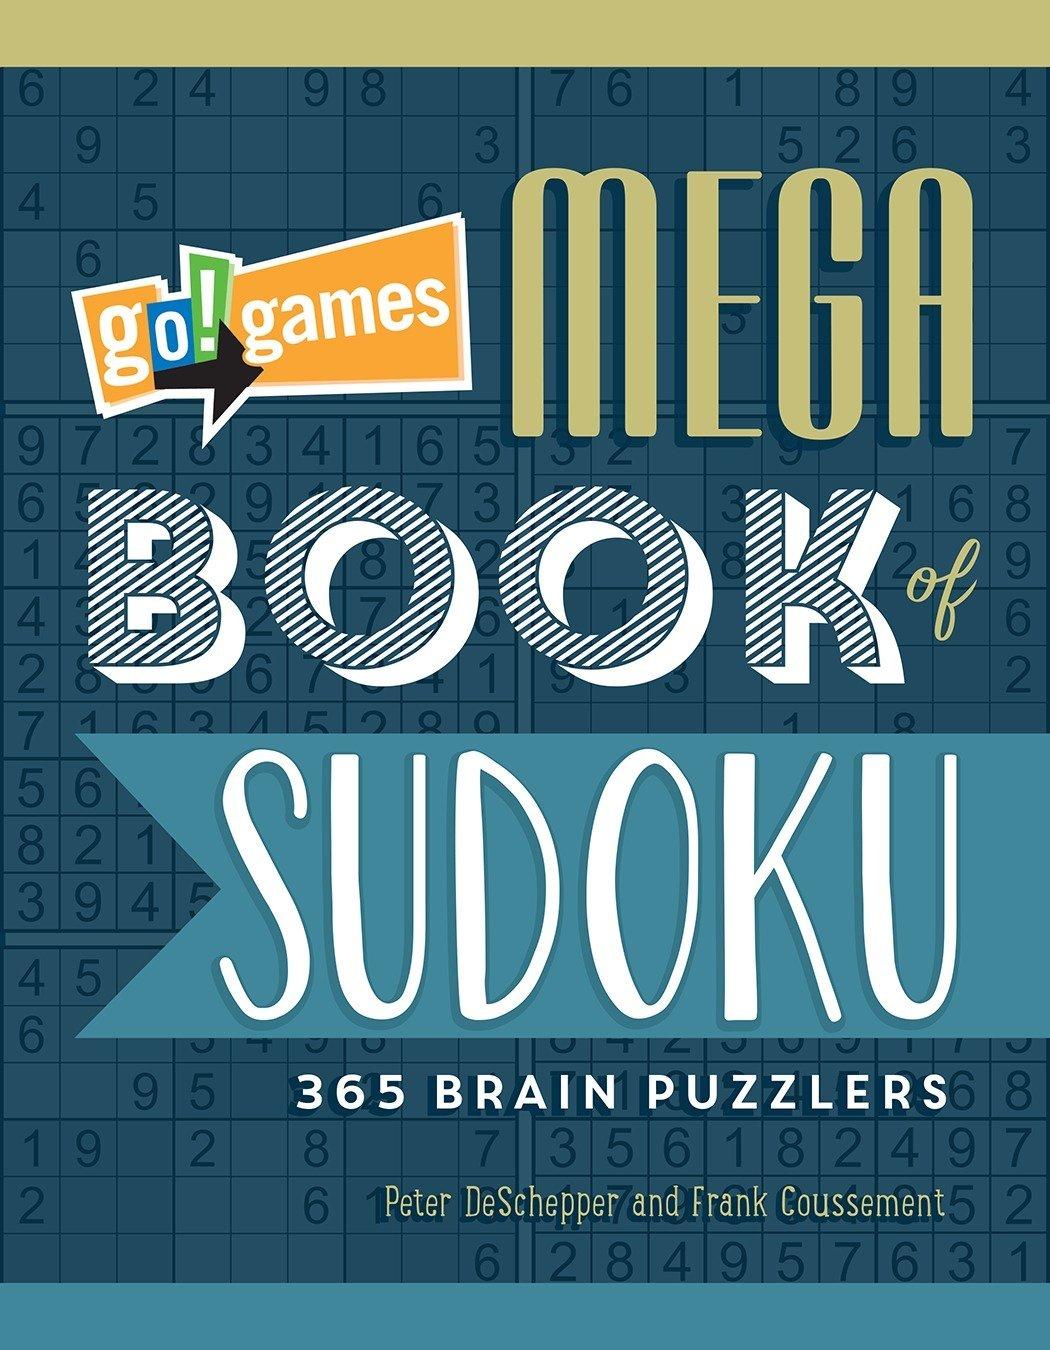 Go!Games Mega Book of Sudoku: 365 Brain Puzzlers ebook